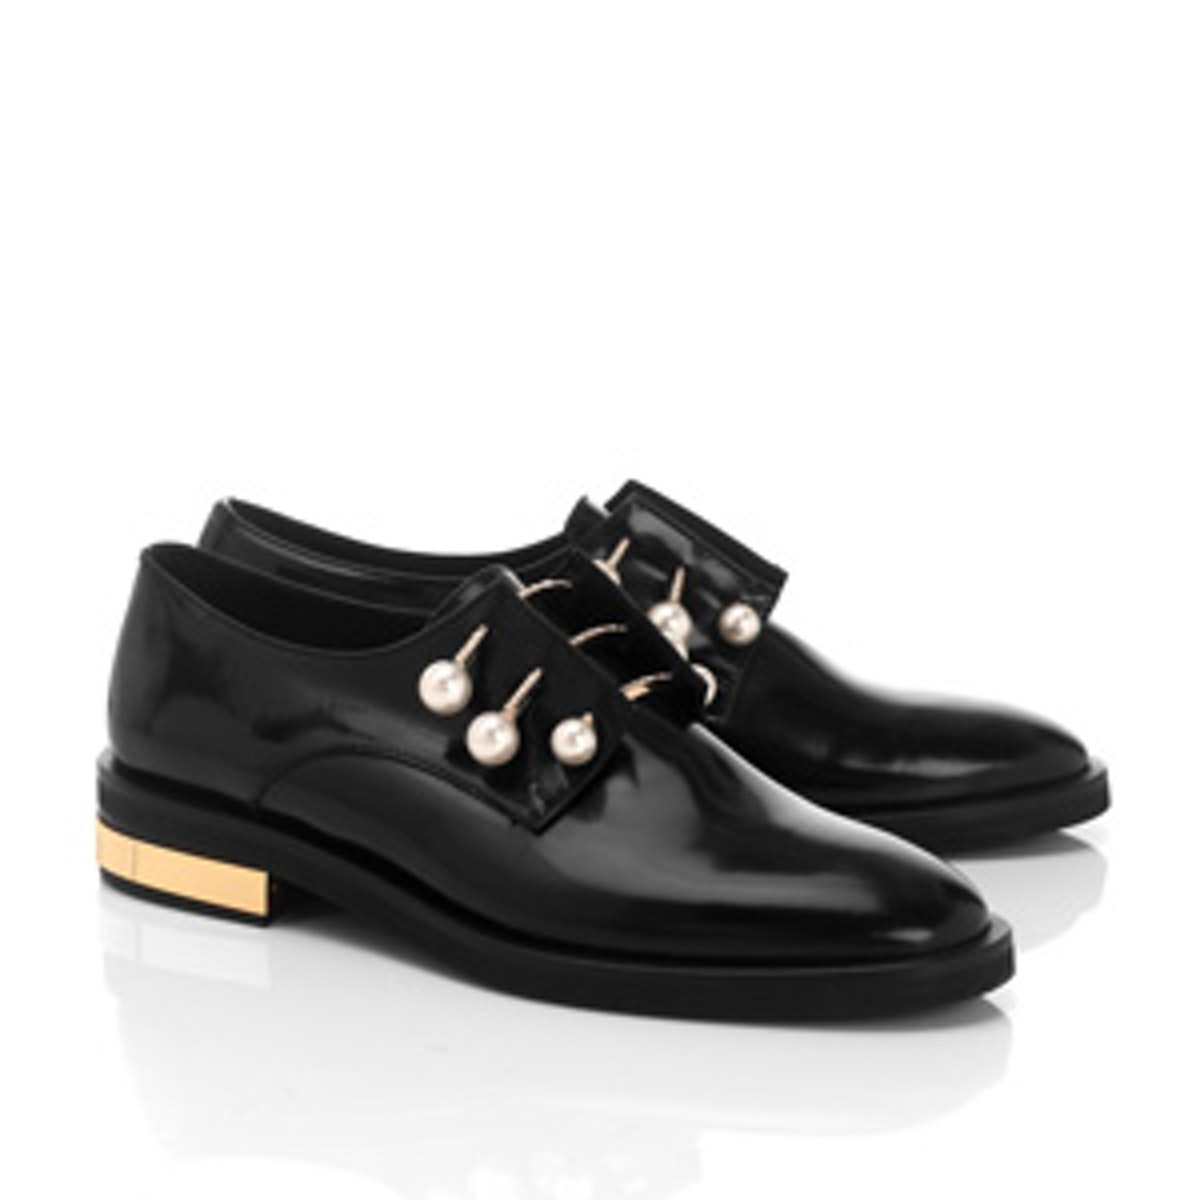 Black Leather Derby Fernanda Shoes